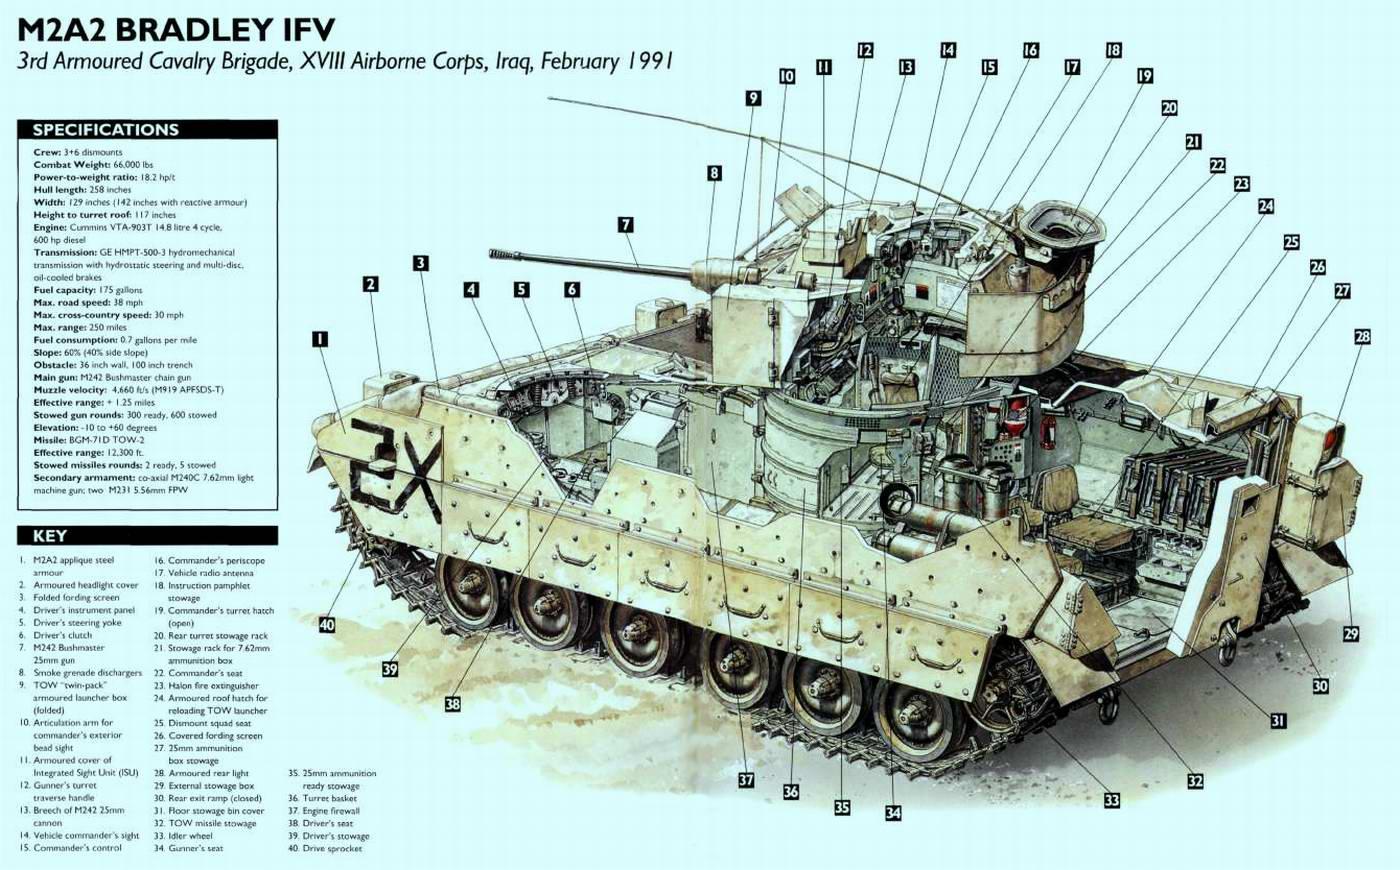 M2A2 Bradley - боевая машина пехоты Брэдли, 1981 год (США)